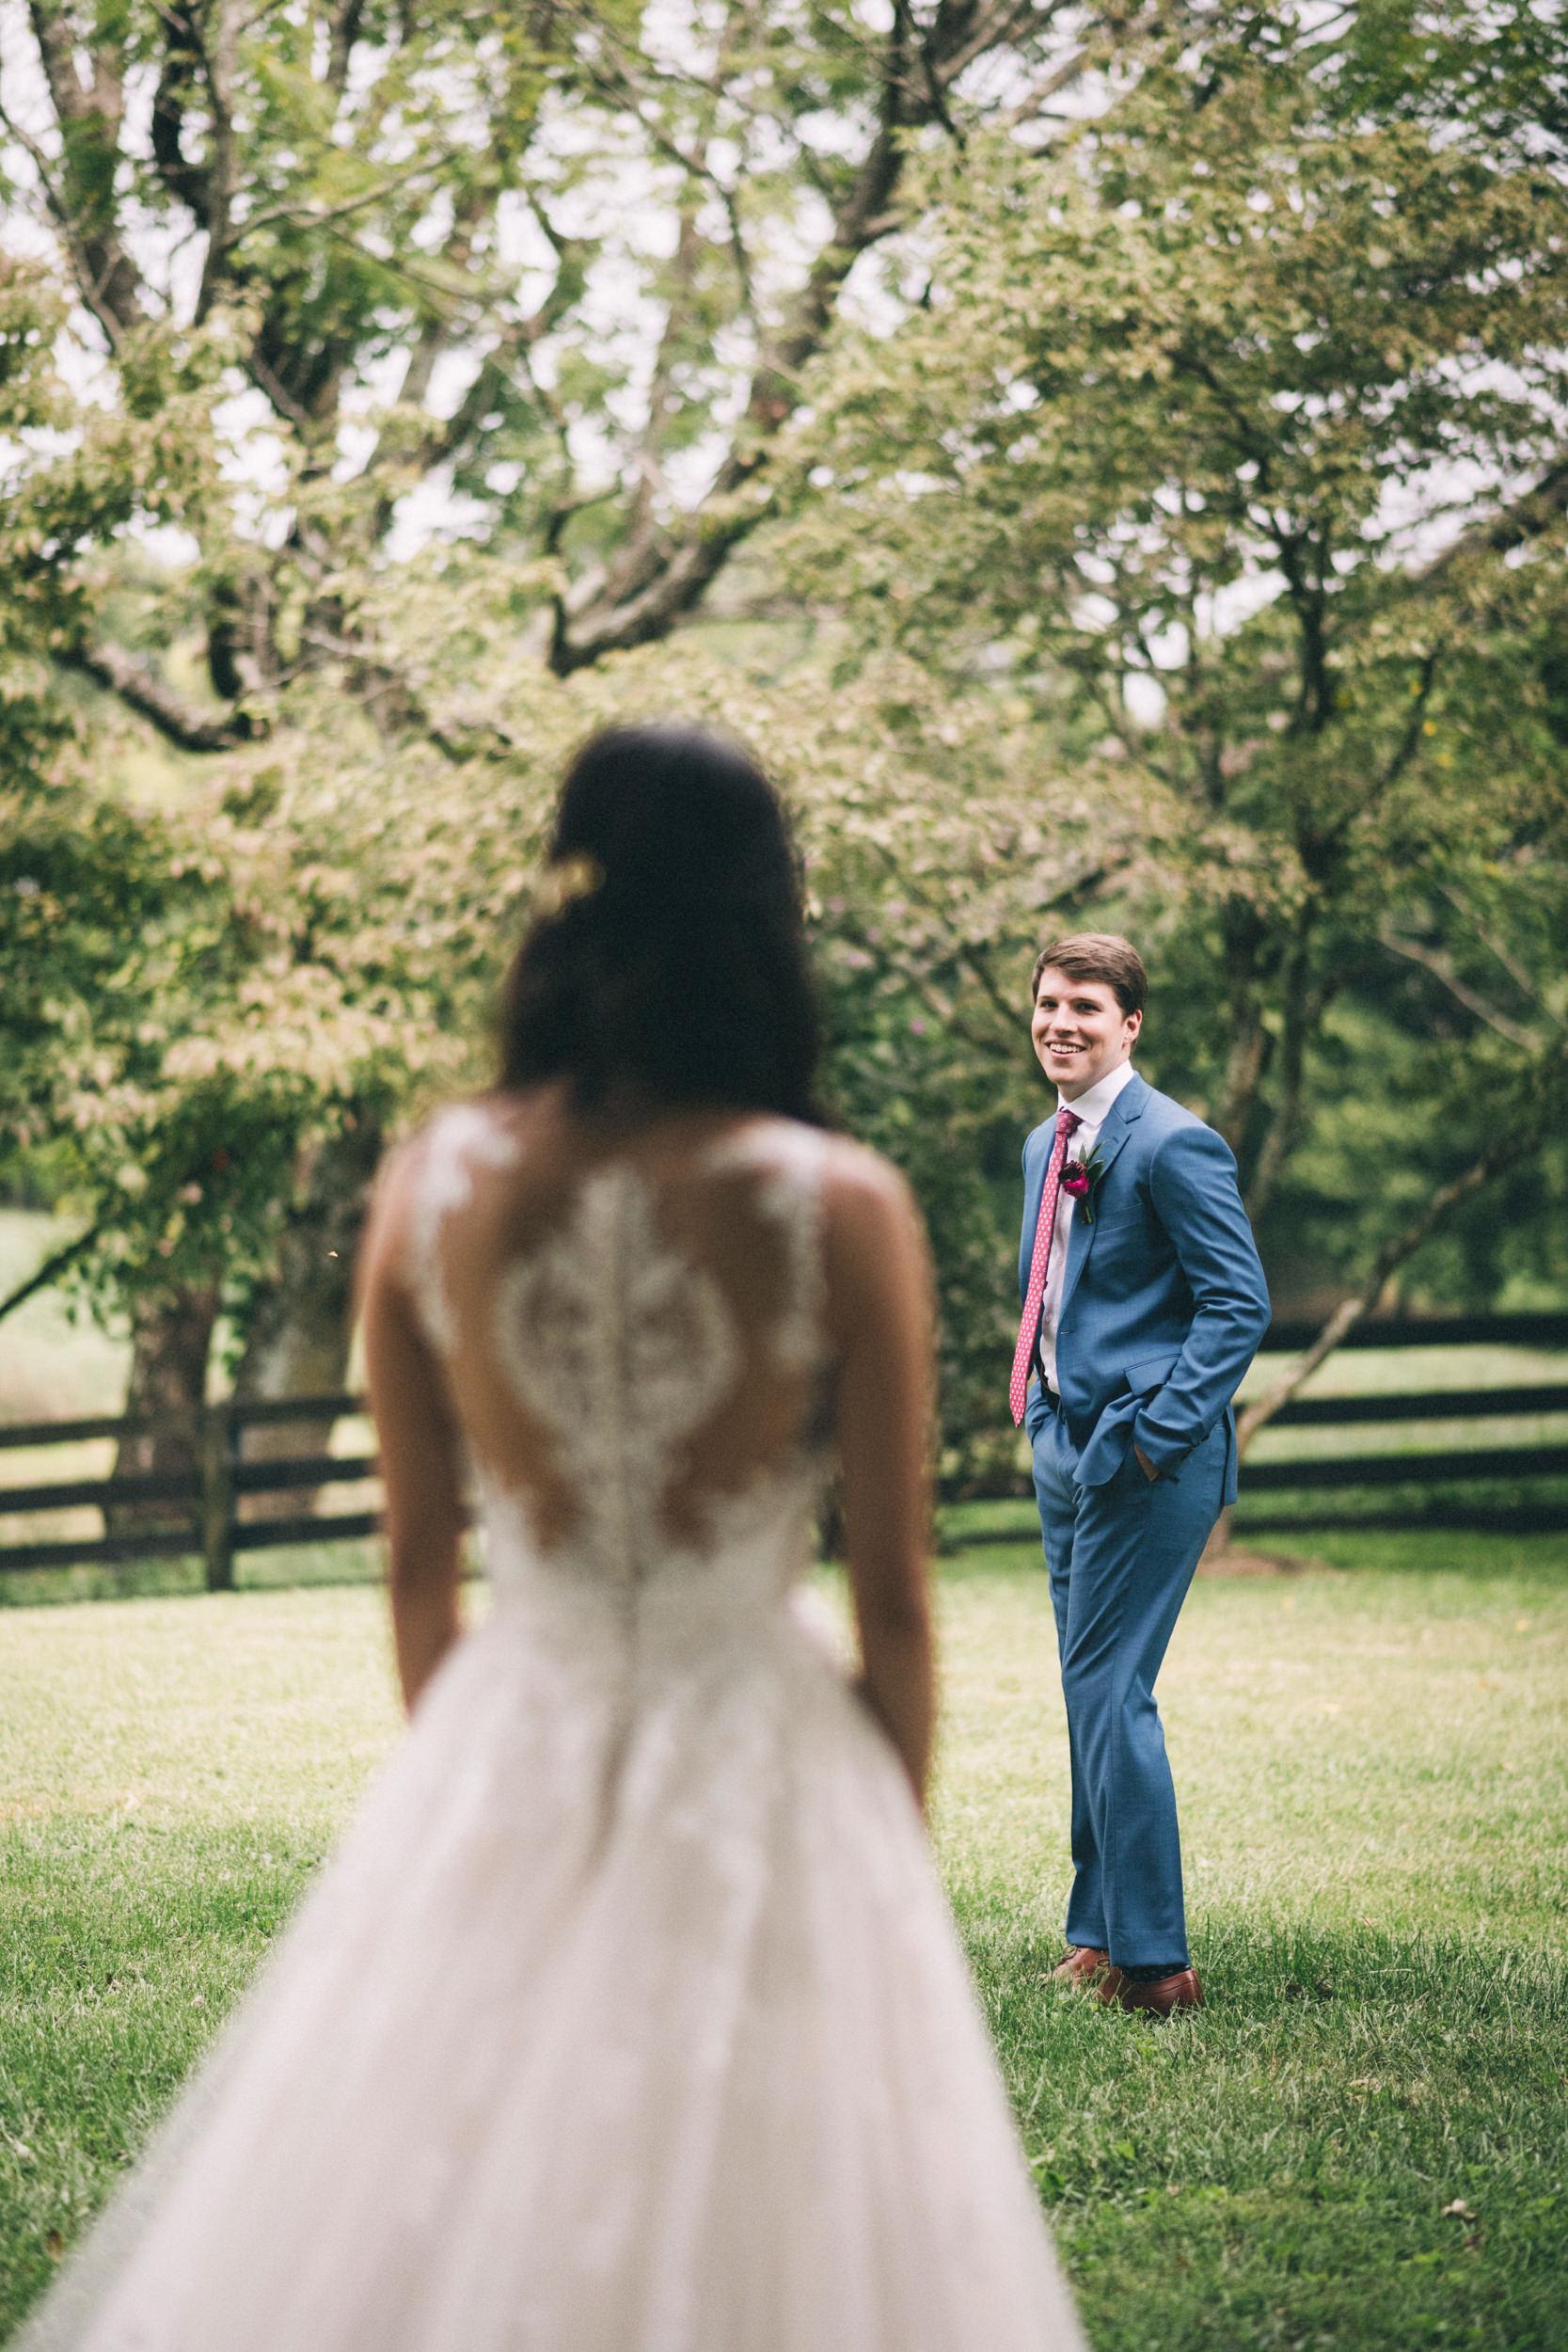 Louisville-Kentucky-Wedding-and-Elopement-Photographer-Sarah-Katherine-Davis-Photography-Summer-Jewel-Toned-Wedding-Chineese-Tea-Ceremony-Warrenwood-Manor-Danville-163.jpg